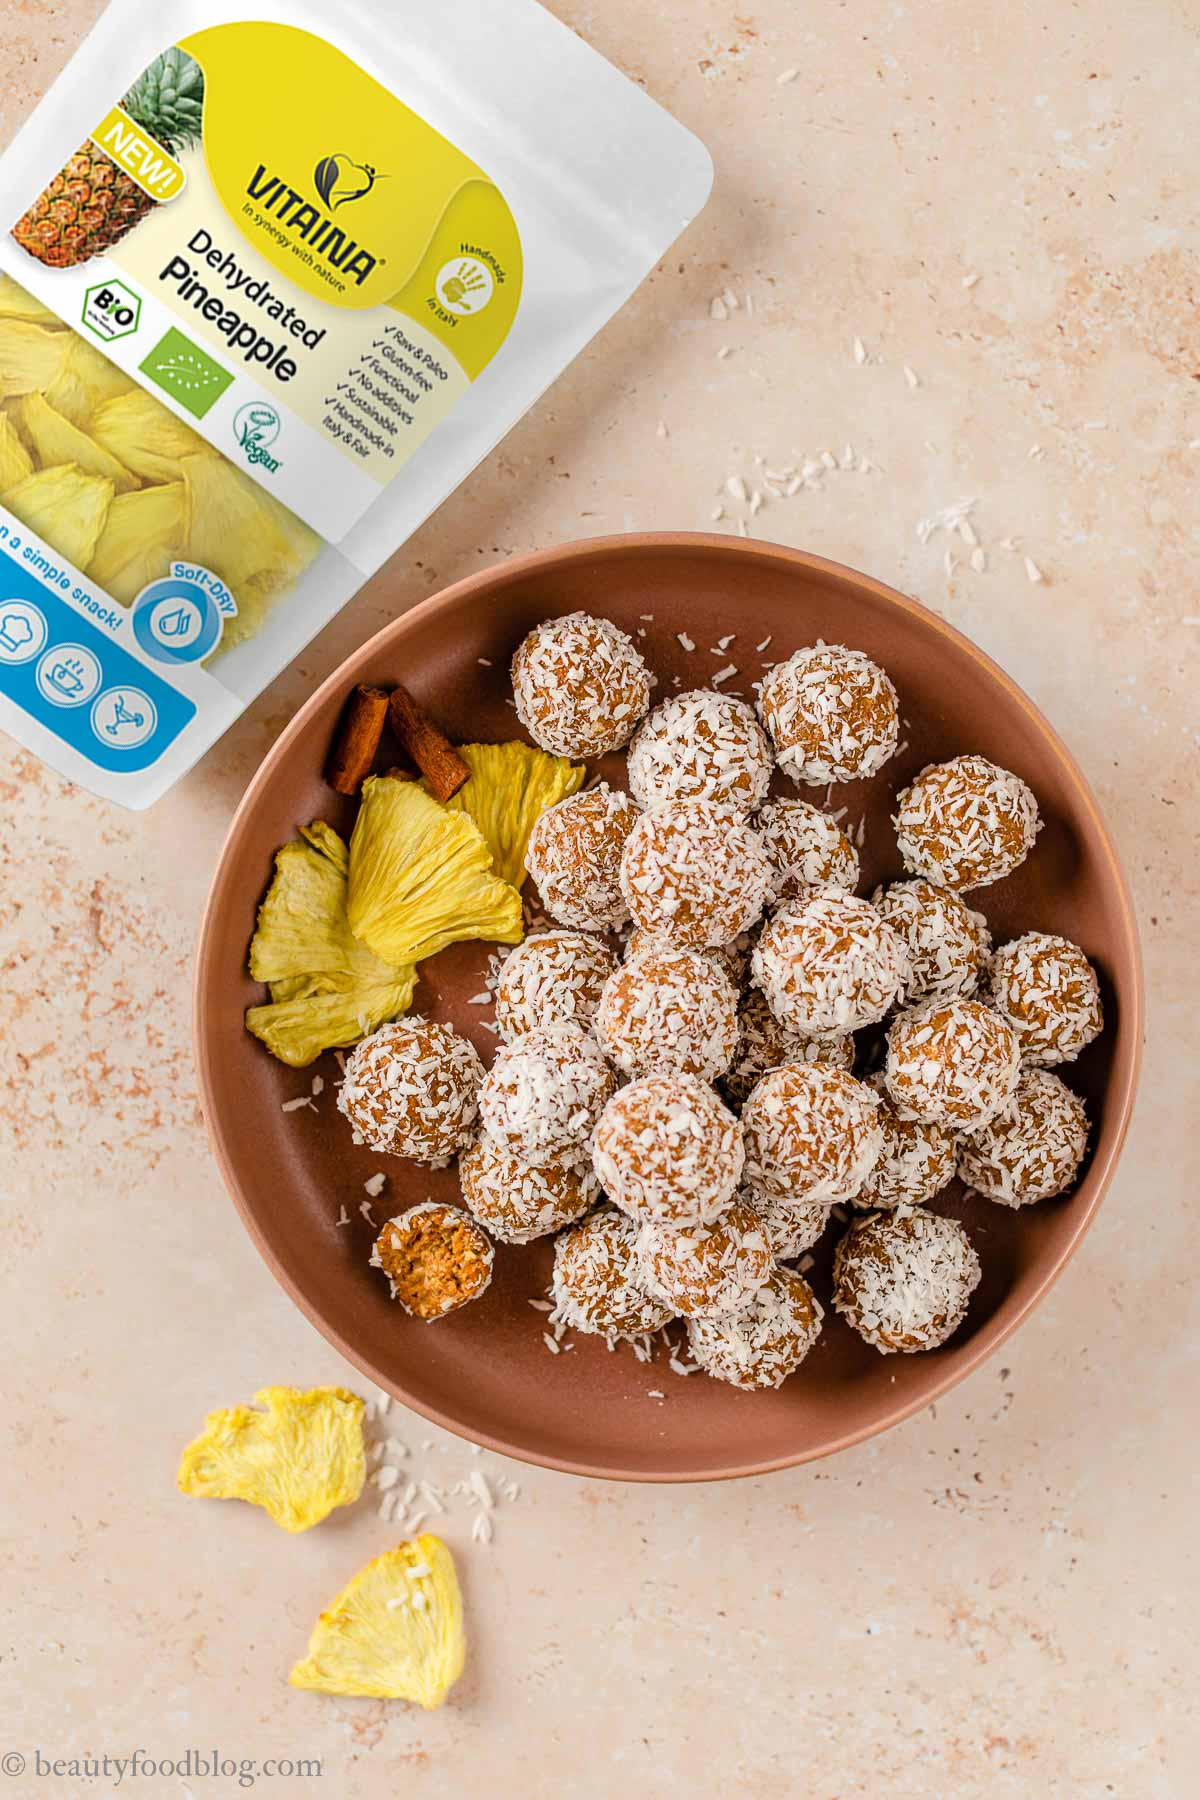 come fare le energy balls alle carote senza glutine senza zuccheri aggiunti how to make no-bake nut-free vegan carrot cake bites with pineapple